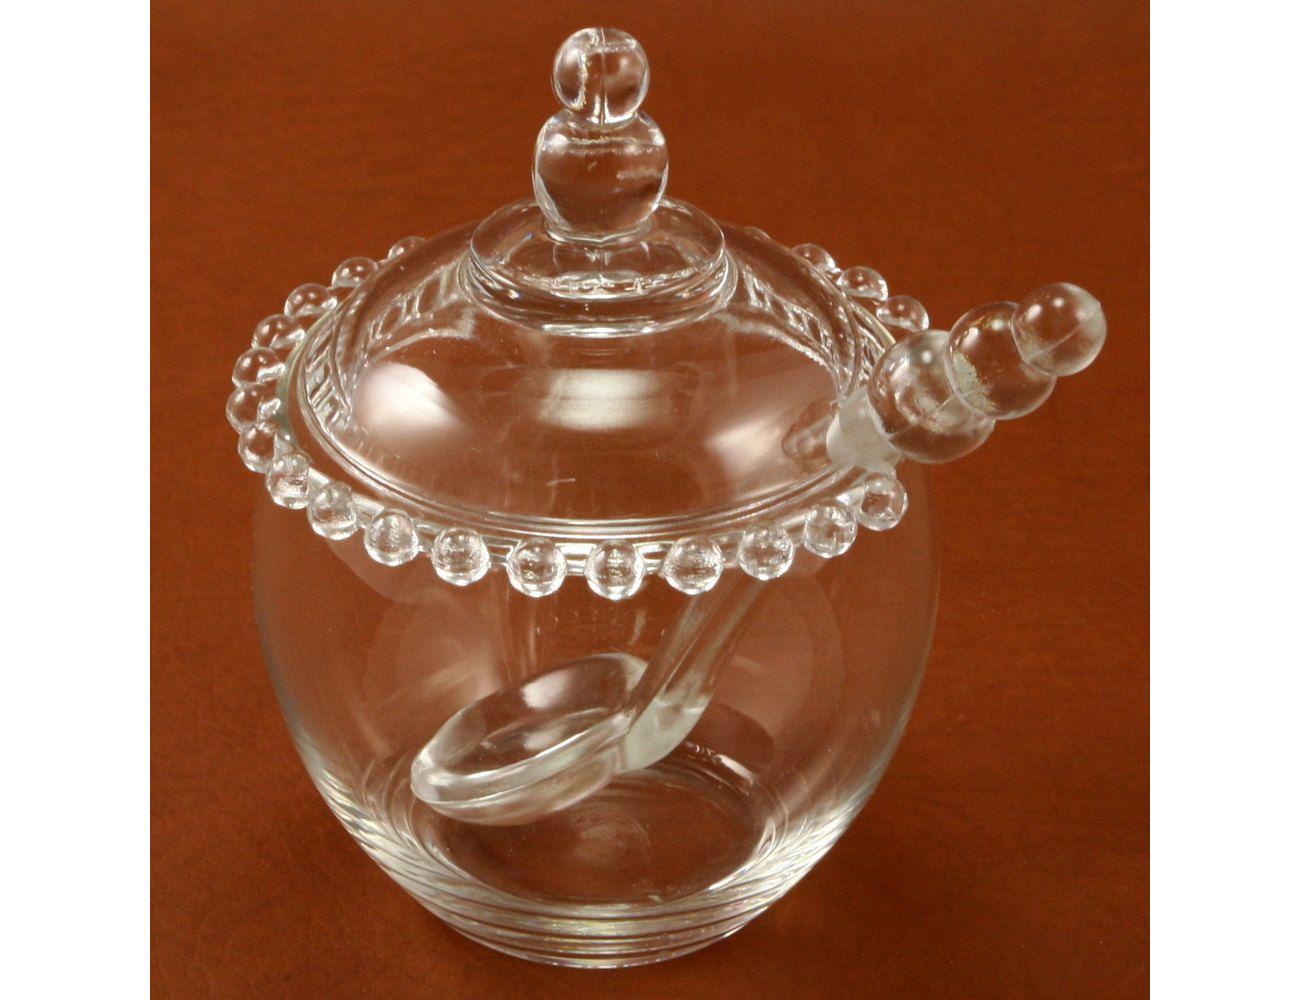 Imperial Glass Candlewick Ladle 3 pc Jam Marmalade Set Vintage.